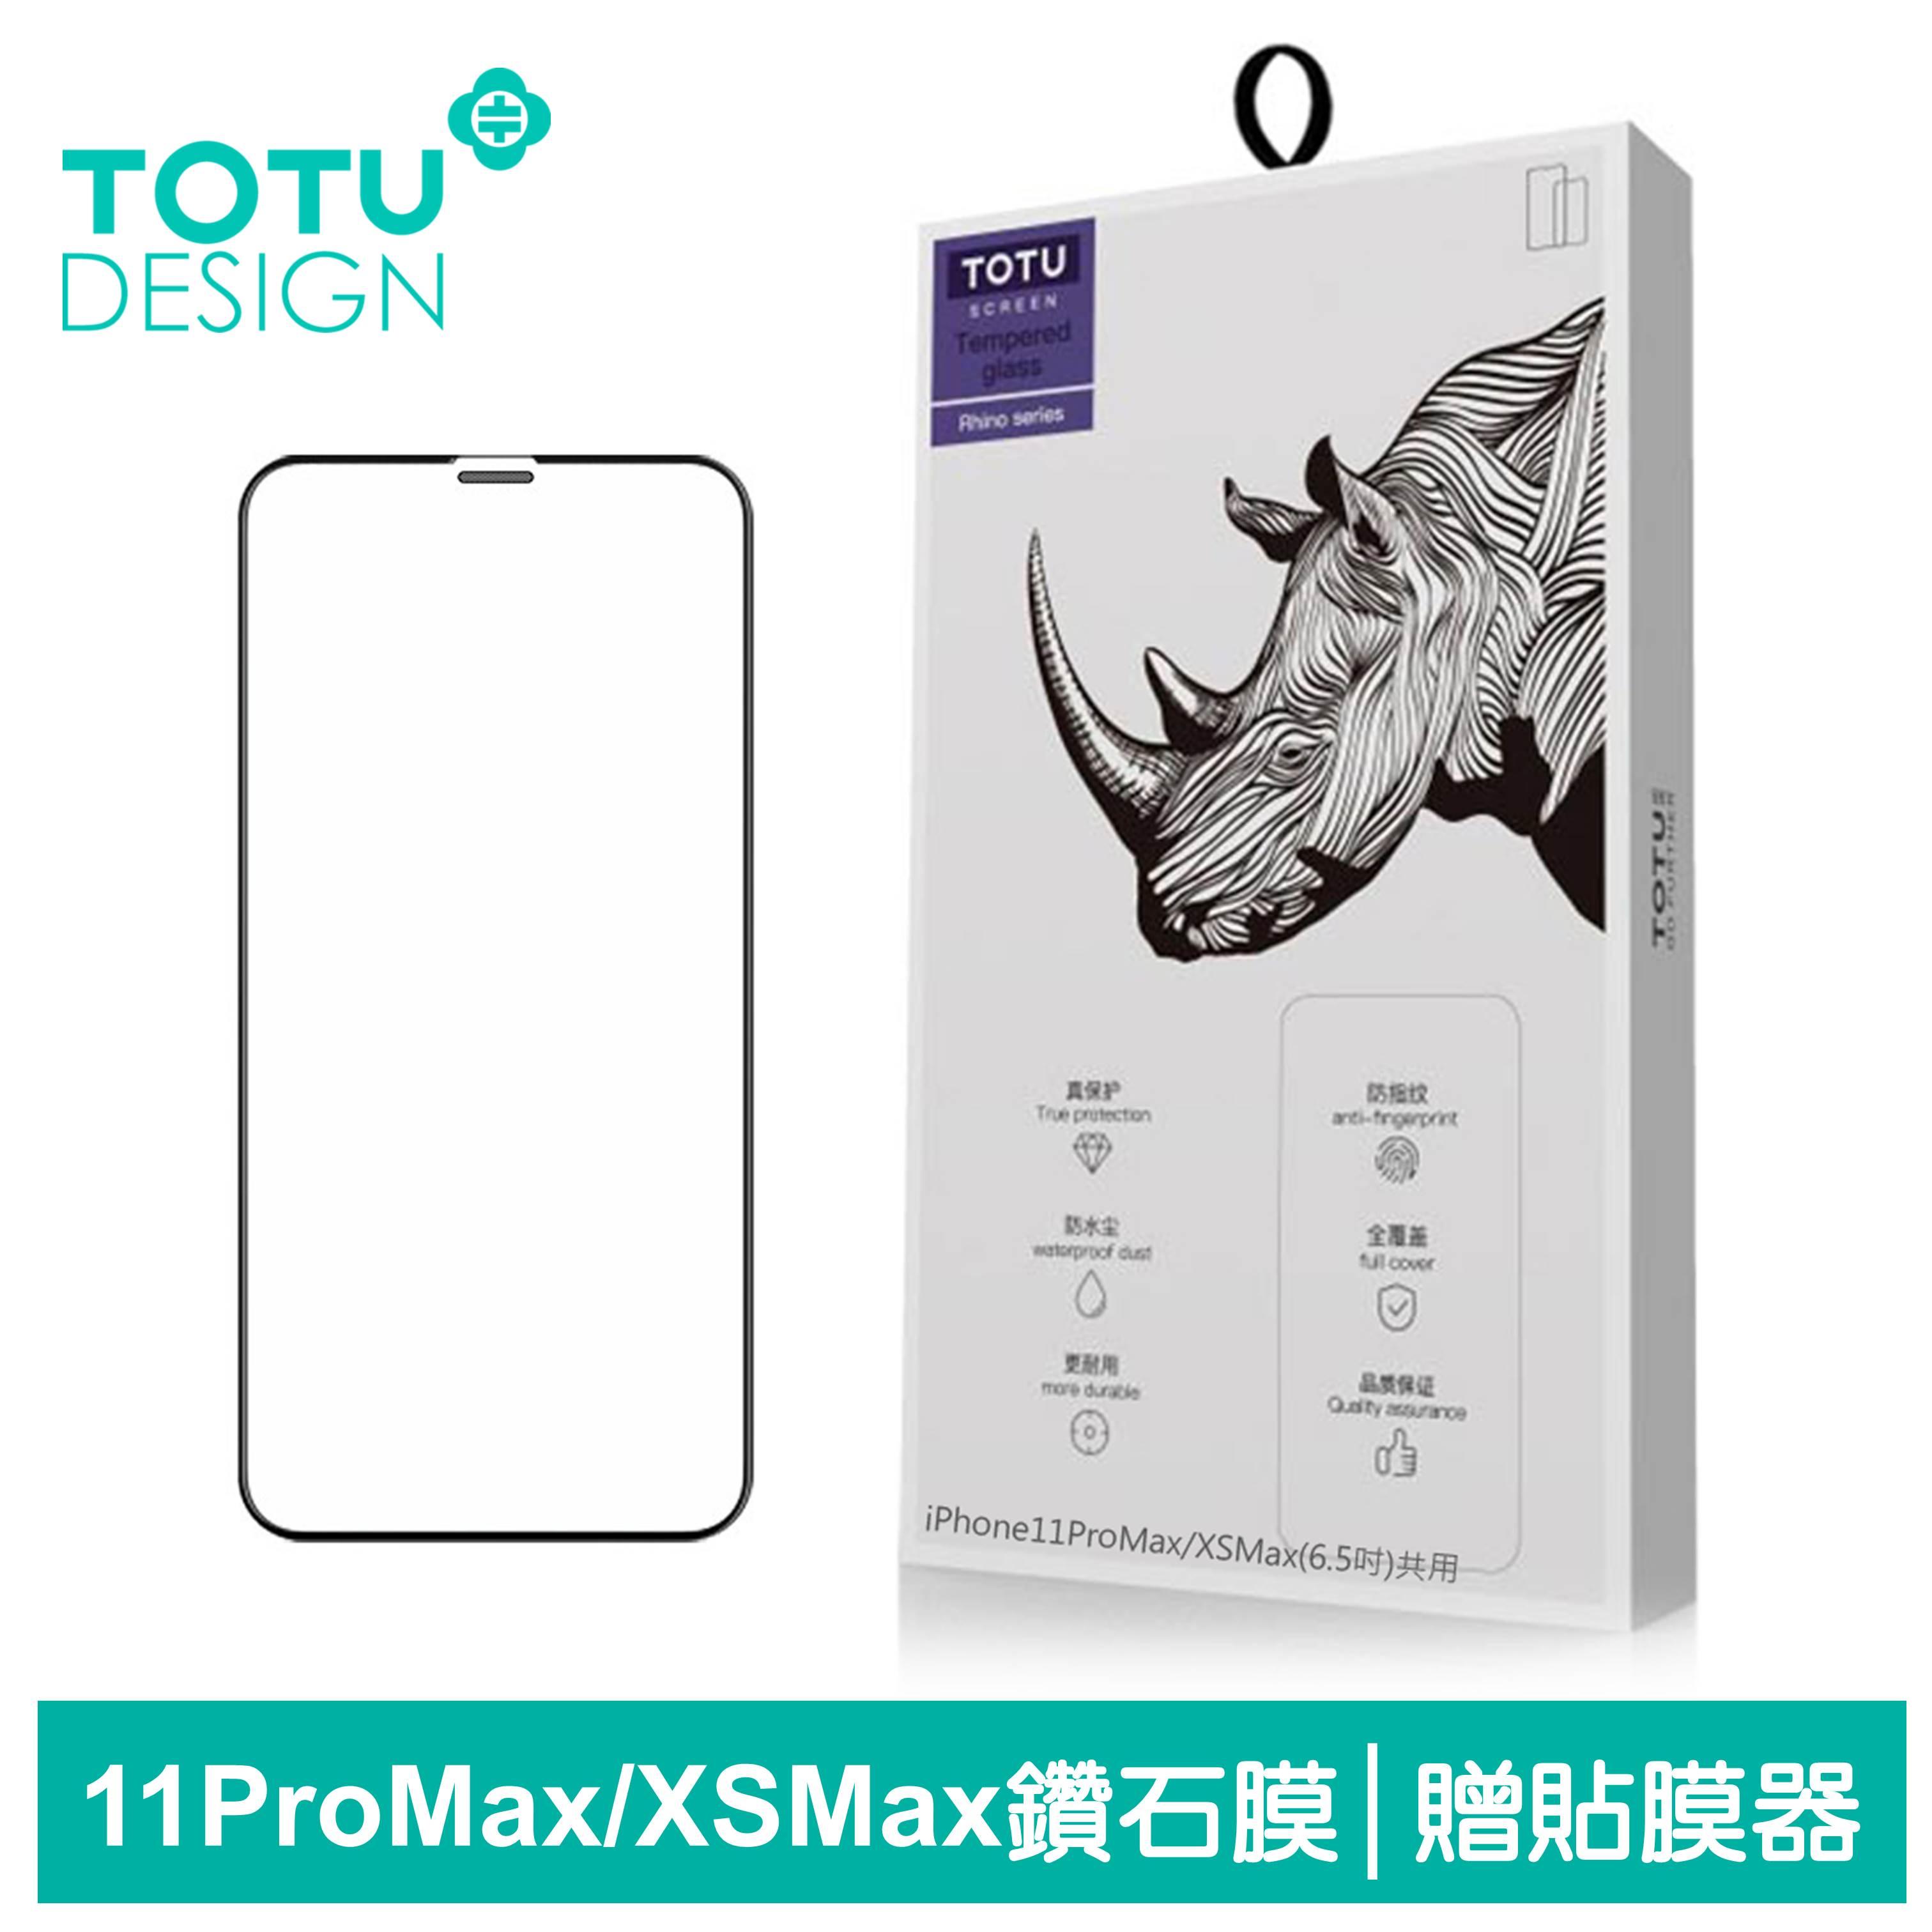 TOTU台灣官方 iPhone11ProMax/XSMax鋼化膜保護貼保貼4K滿版寶石防塵 贈貼膜器 犀牛家族